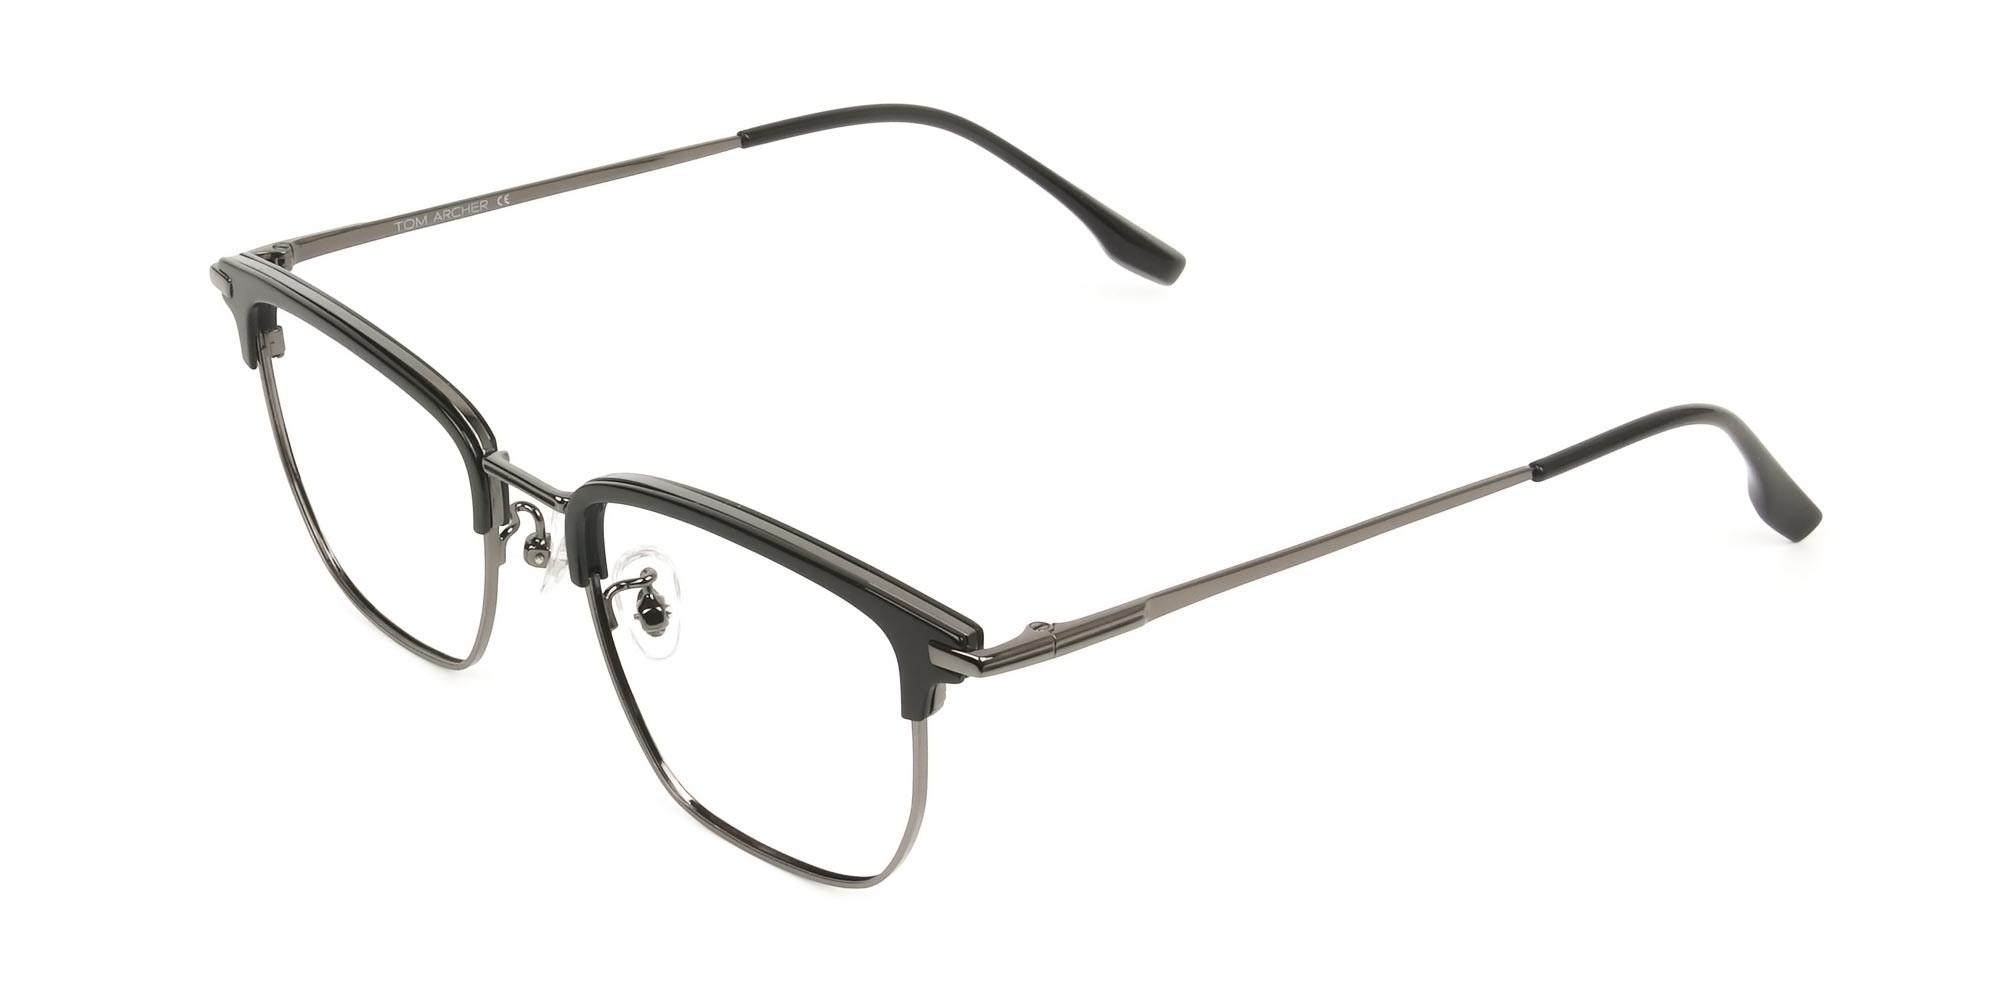 Wayfarer Browline Black & Gunmetal Large Frame Glasses - 3